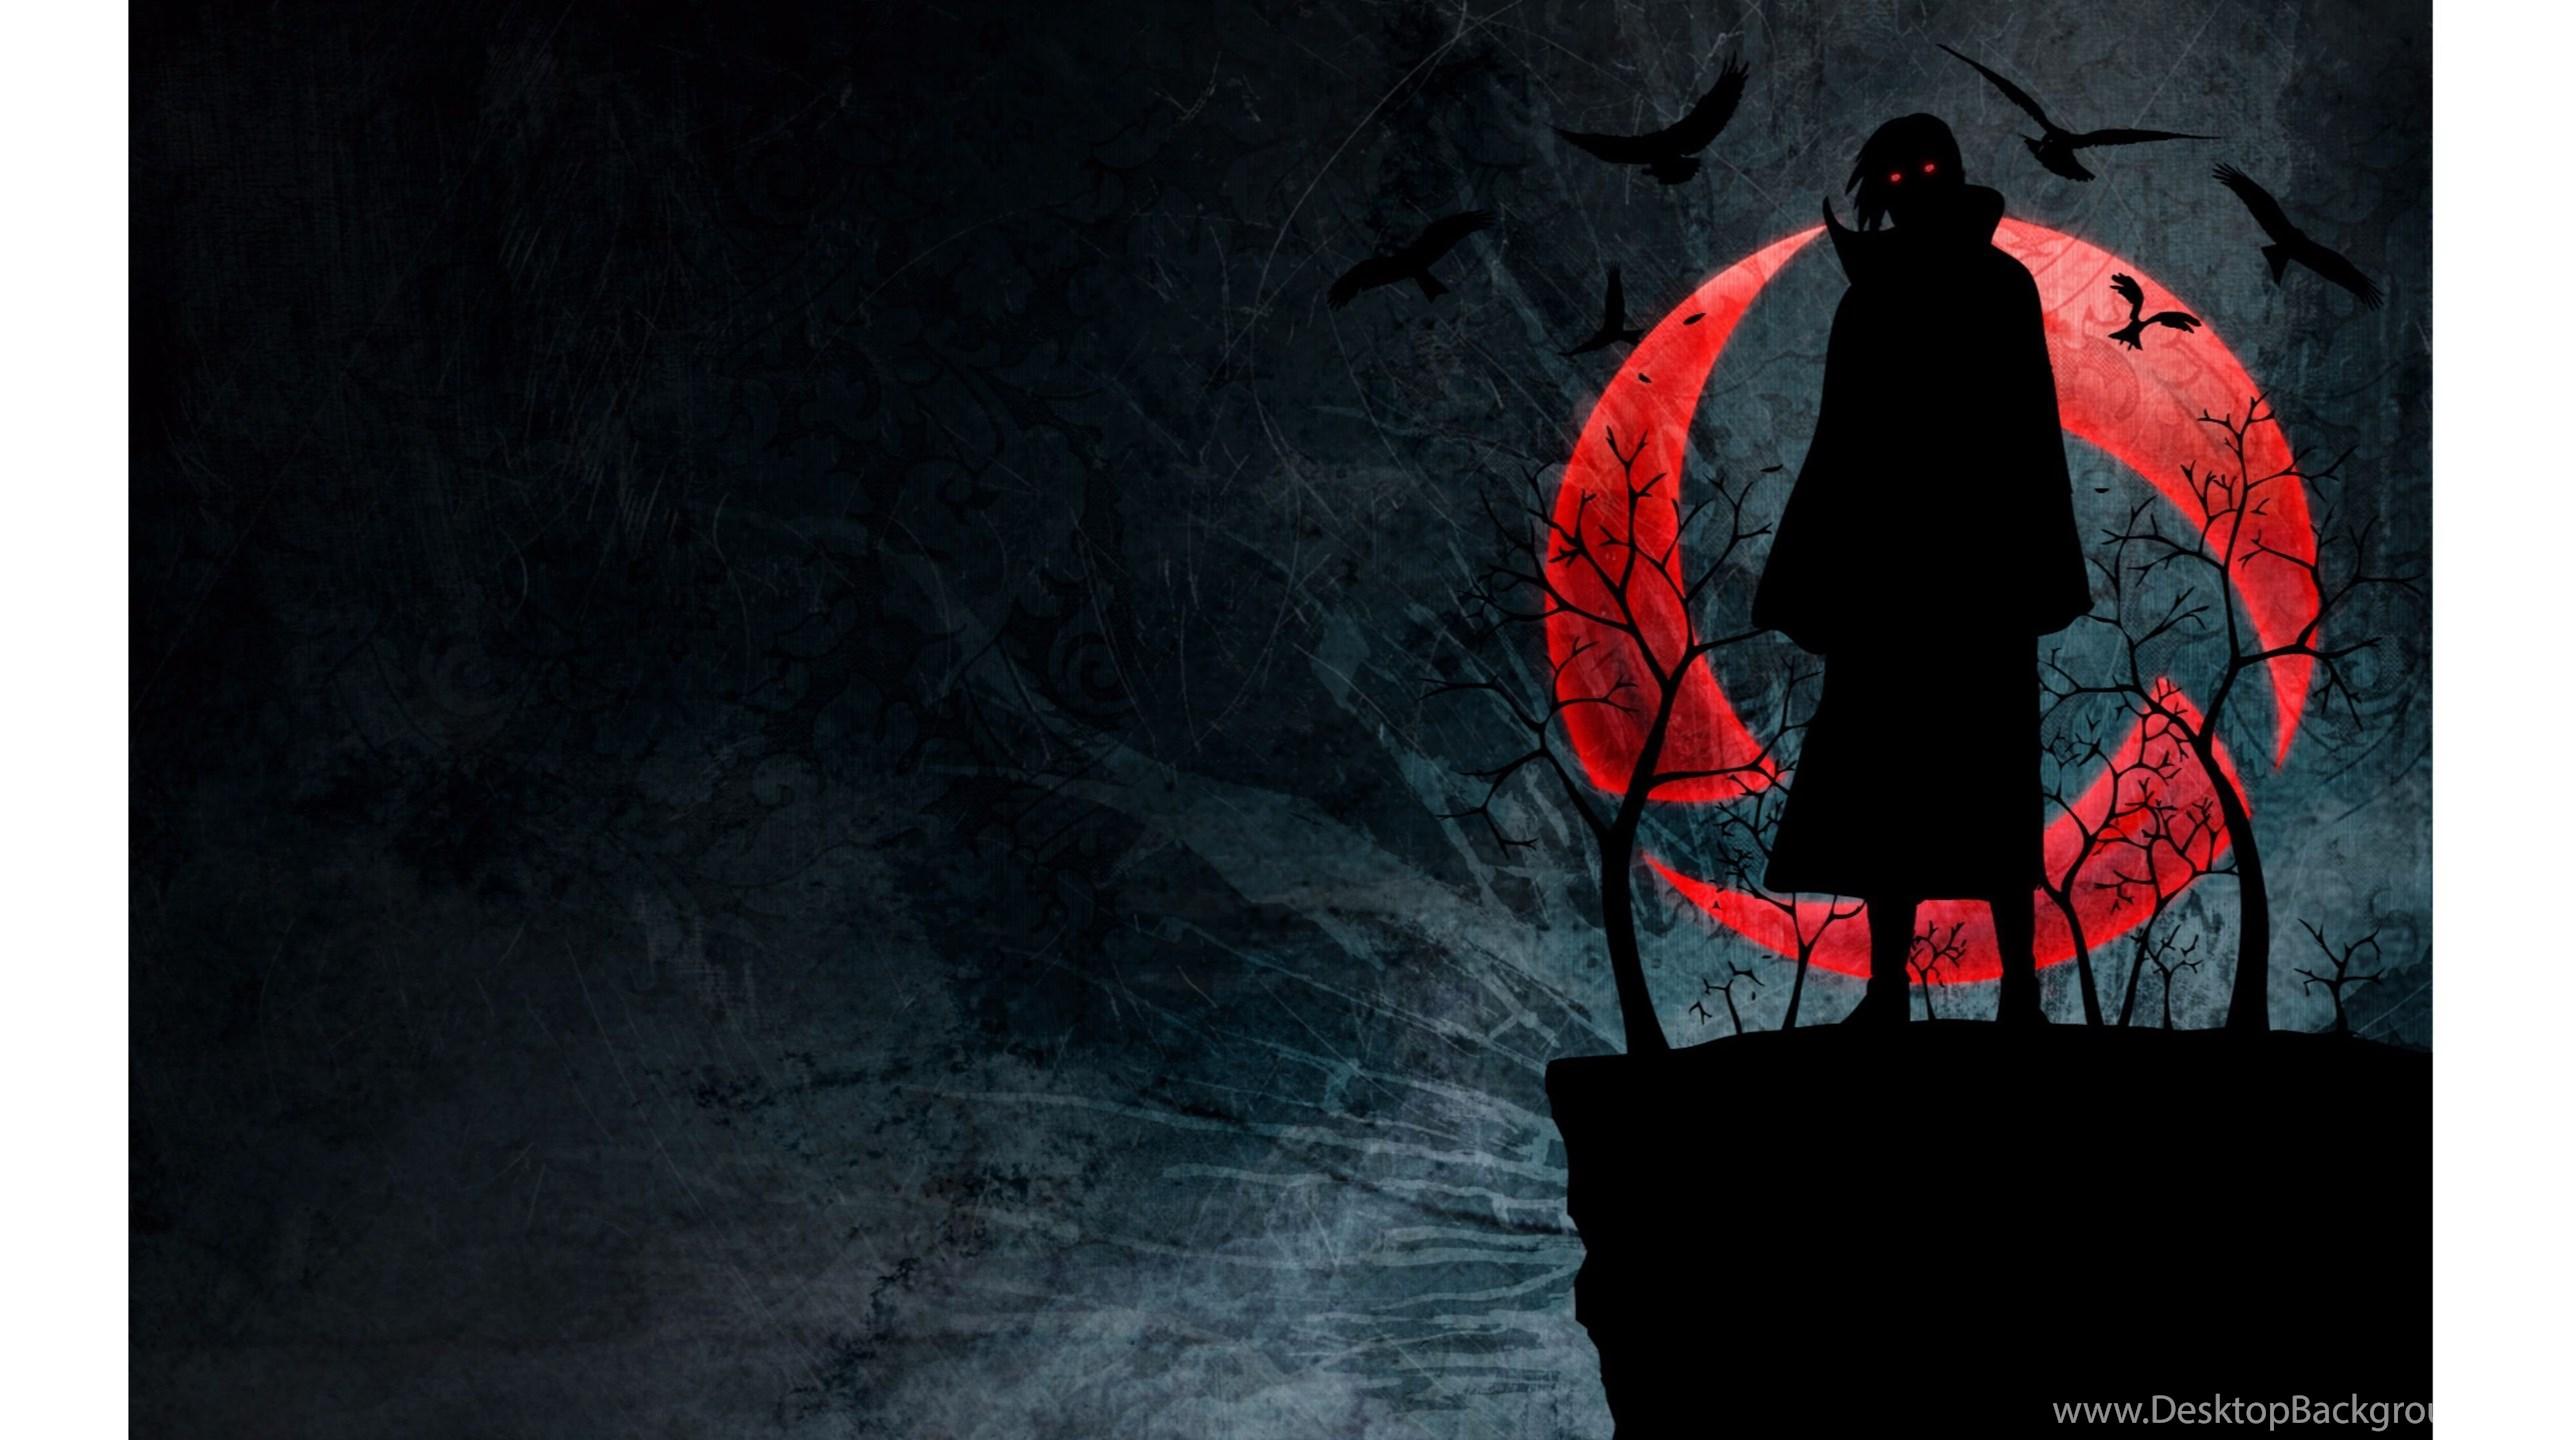 anime dark wallpapers 4k: Scary Night 4K Anime Wallpapers Desktop Background